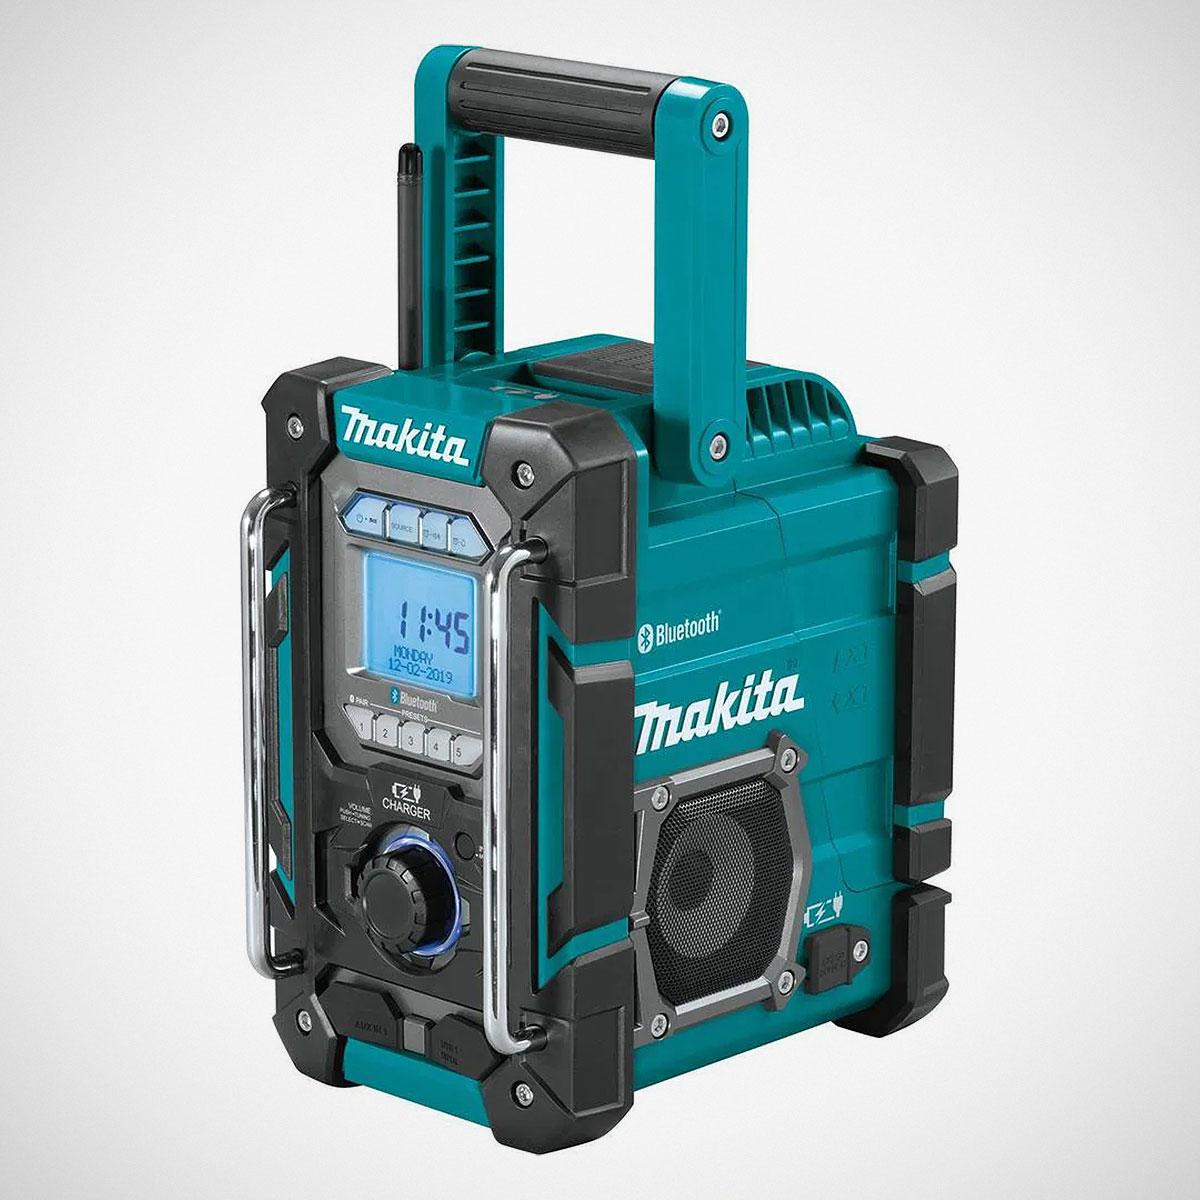 Makita Cordless Bluetooth Job Site Charger and Radio